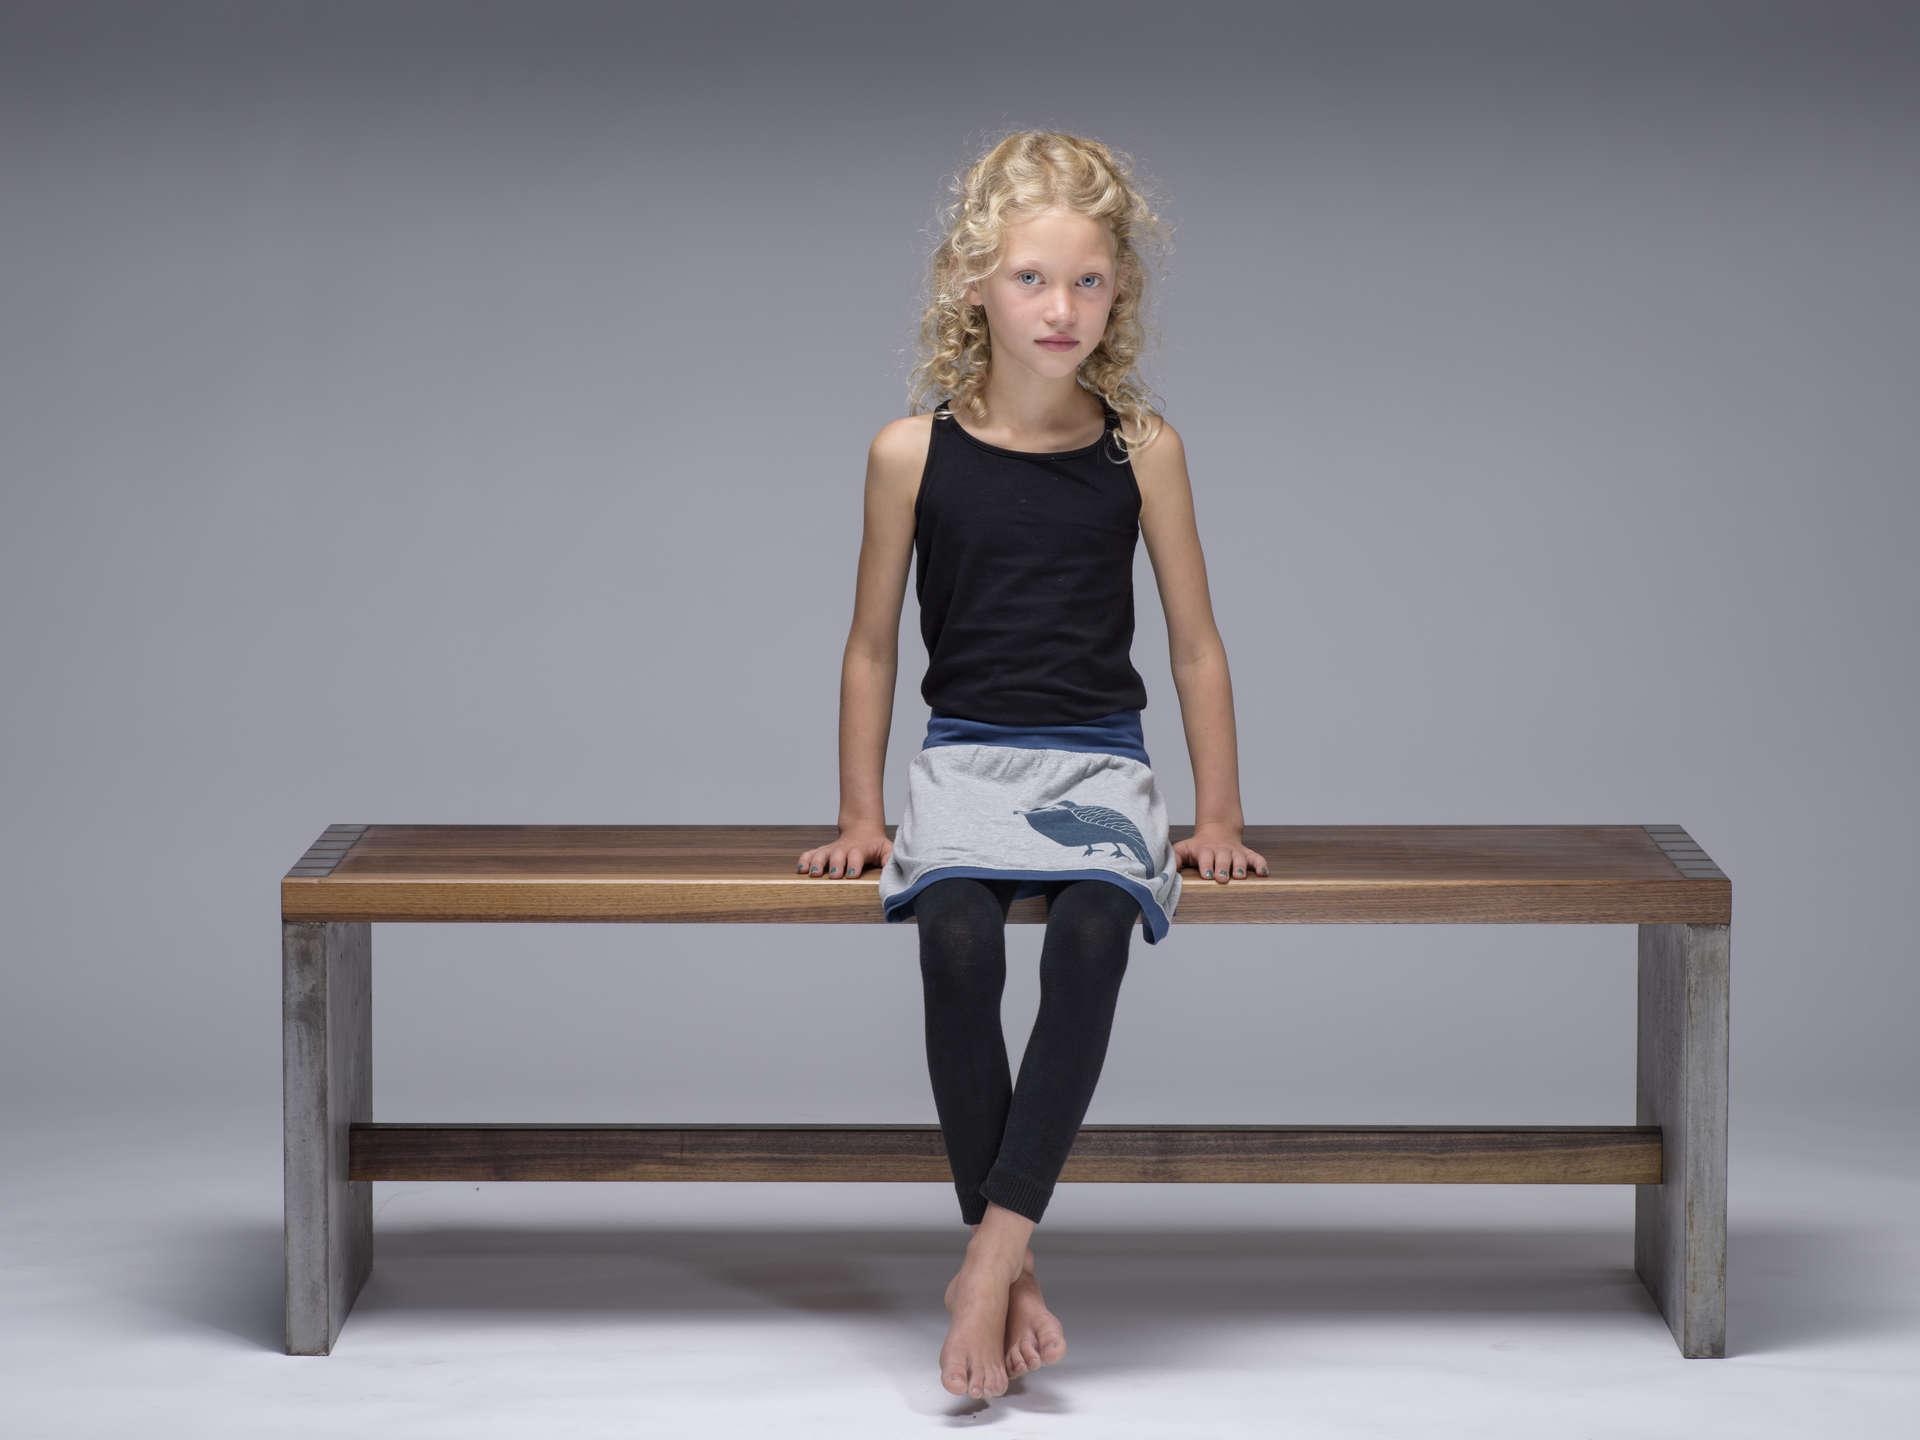 Model sitzend auf Massivholz Beton Sitzbank.